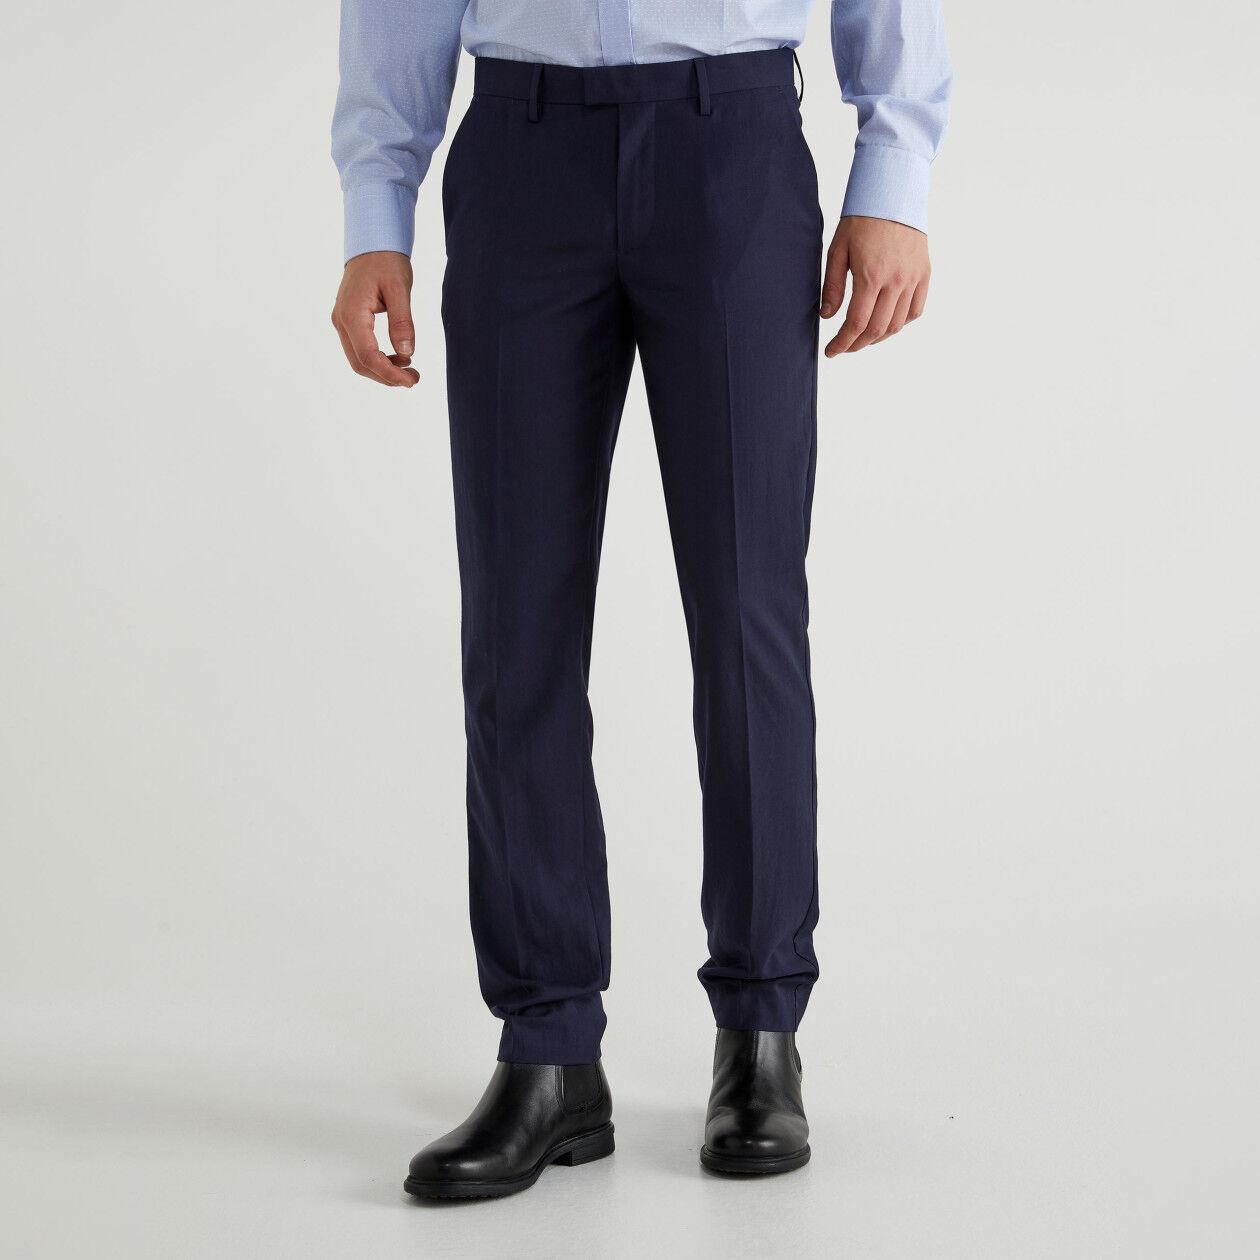 Pantaloni con piega stirata